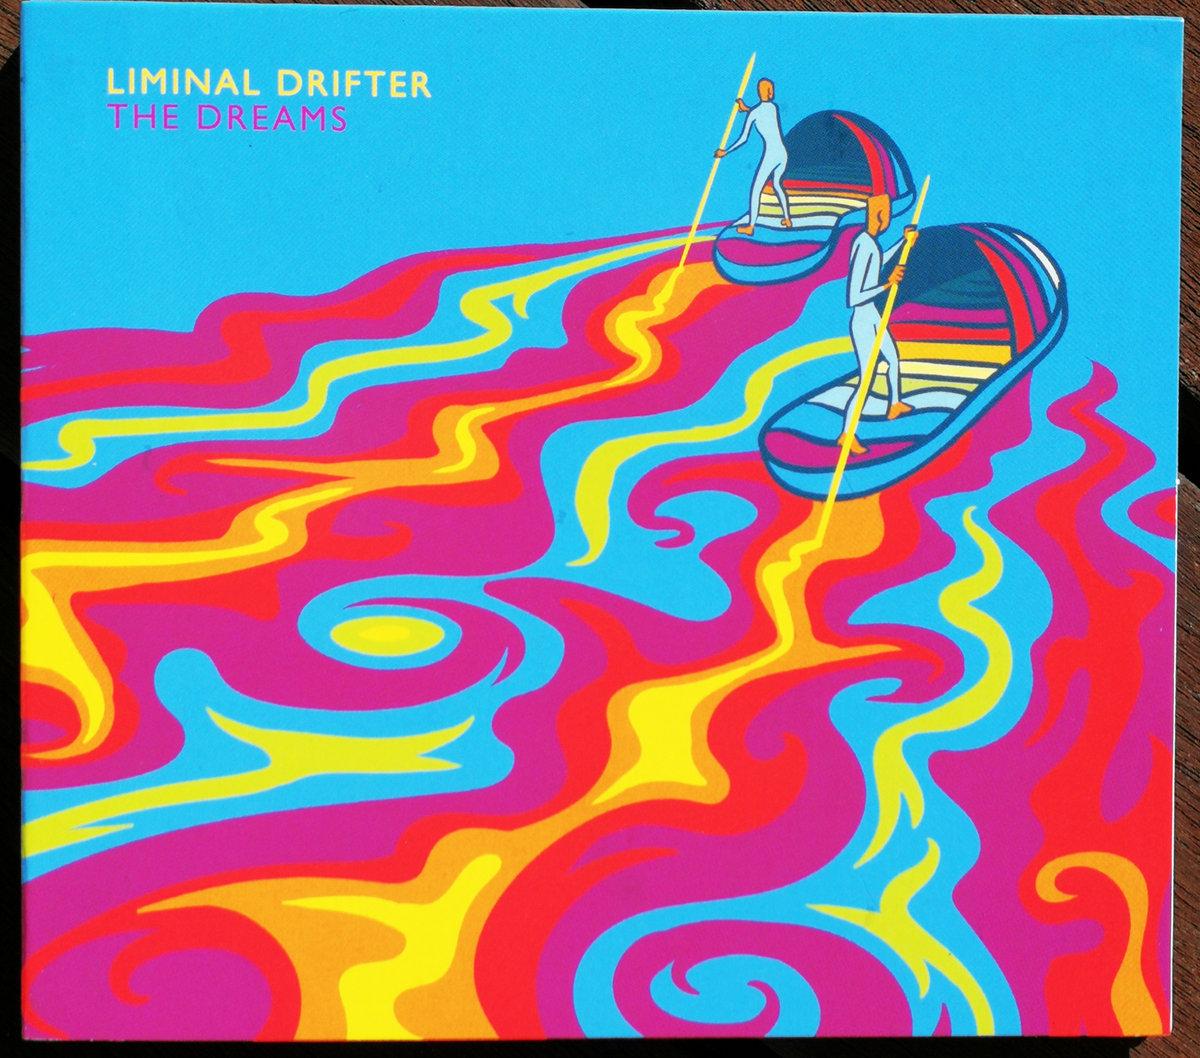 The Dreams   Liminal Drifter